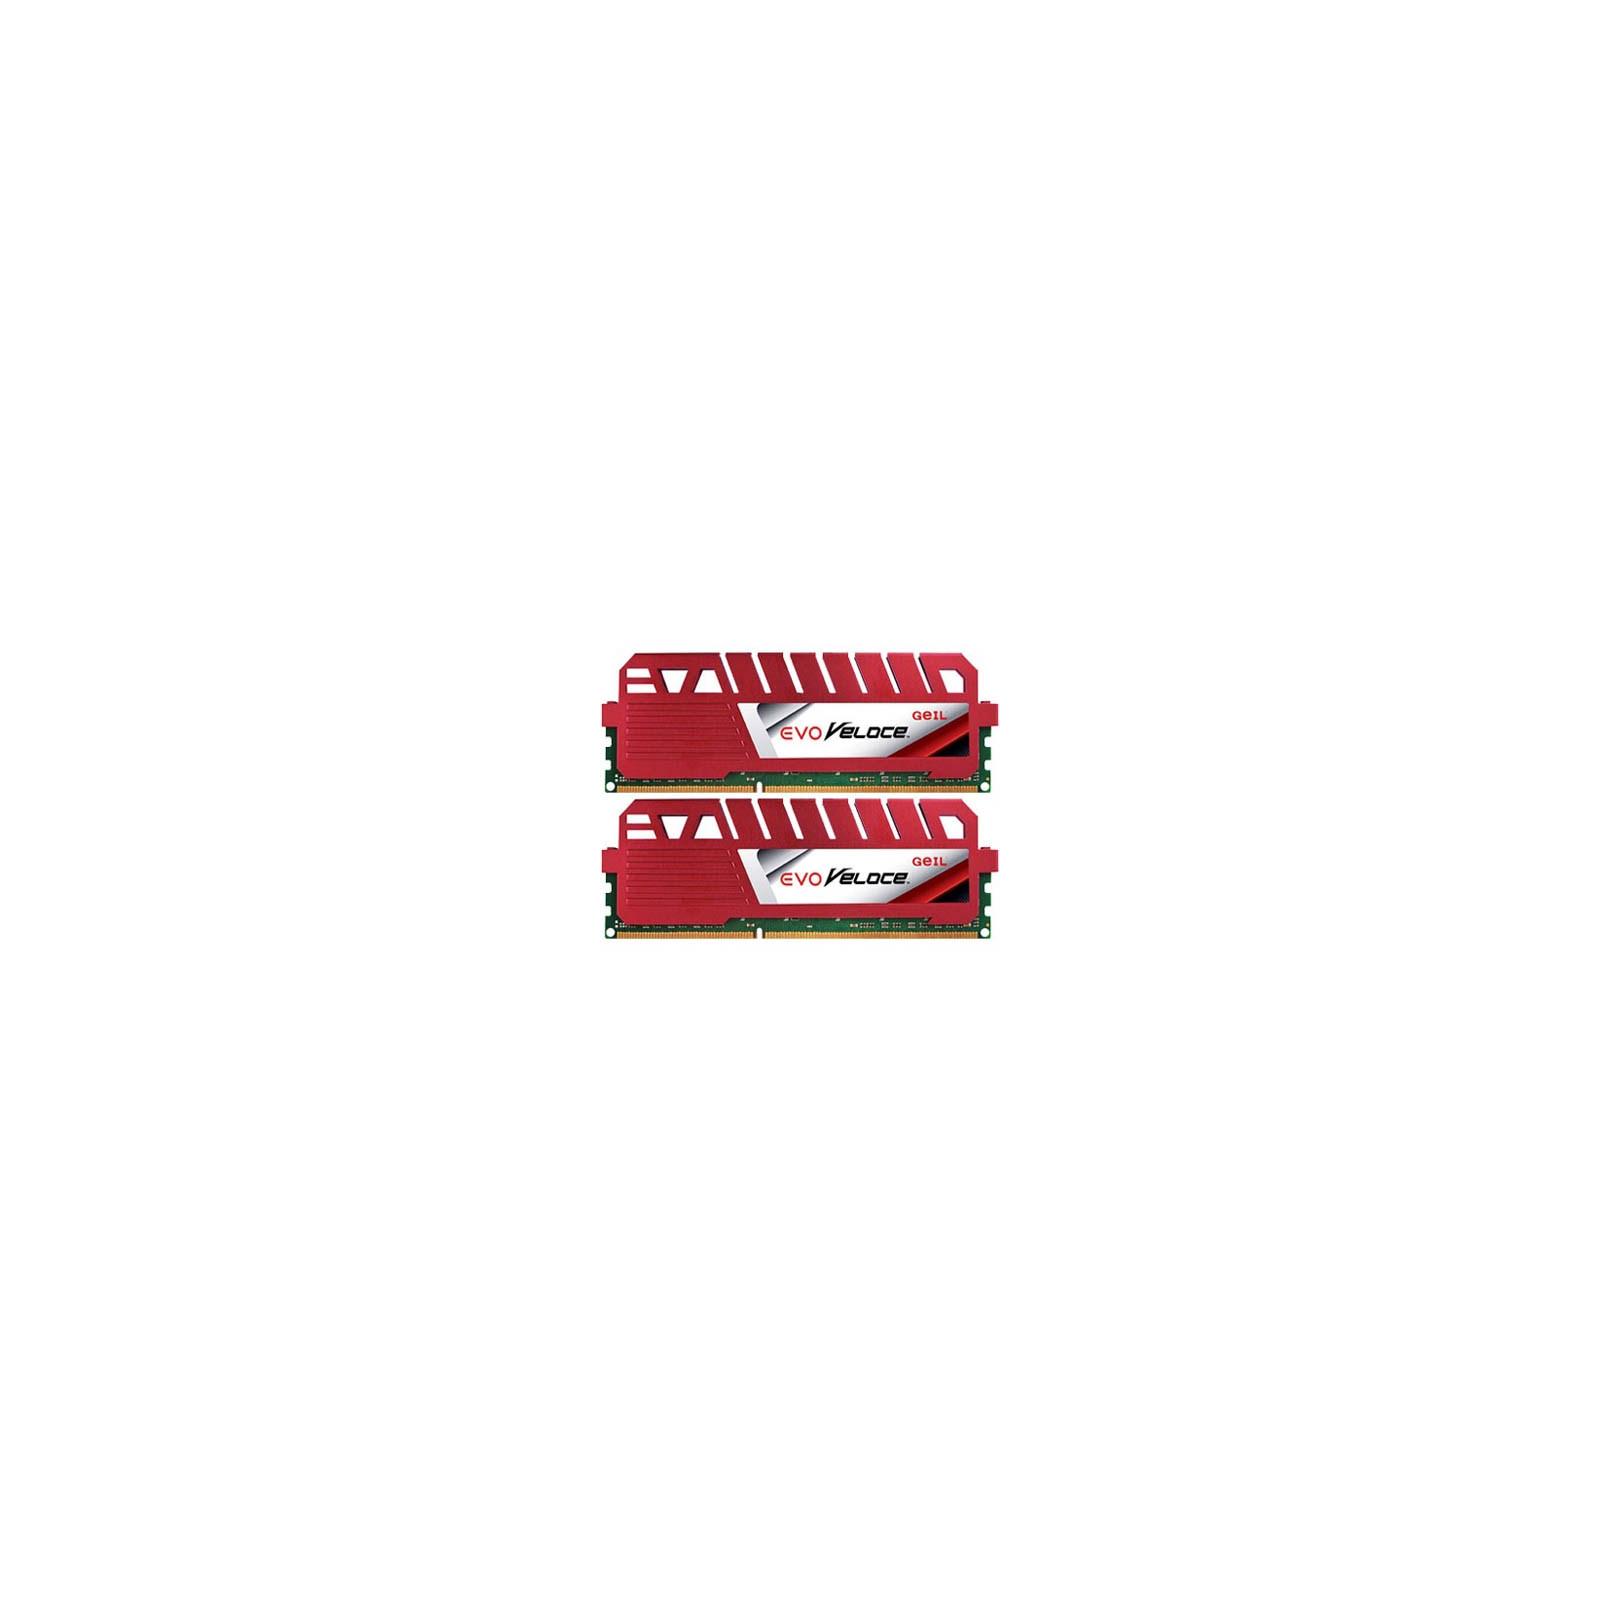 Модуль памяти для компьютера DDR3 16GB (2x8GB) 1866 MHz GEIL (GEV316GB1866C9DC)